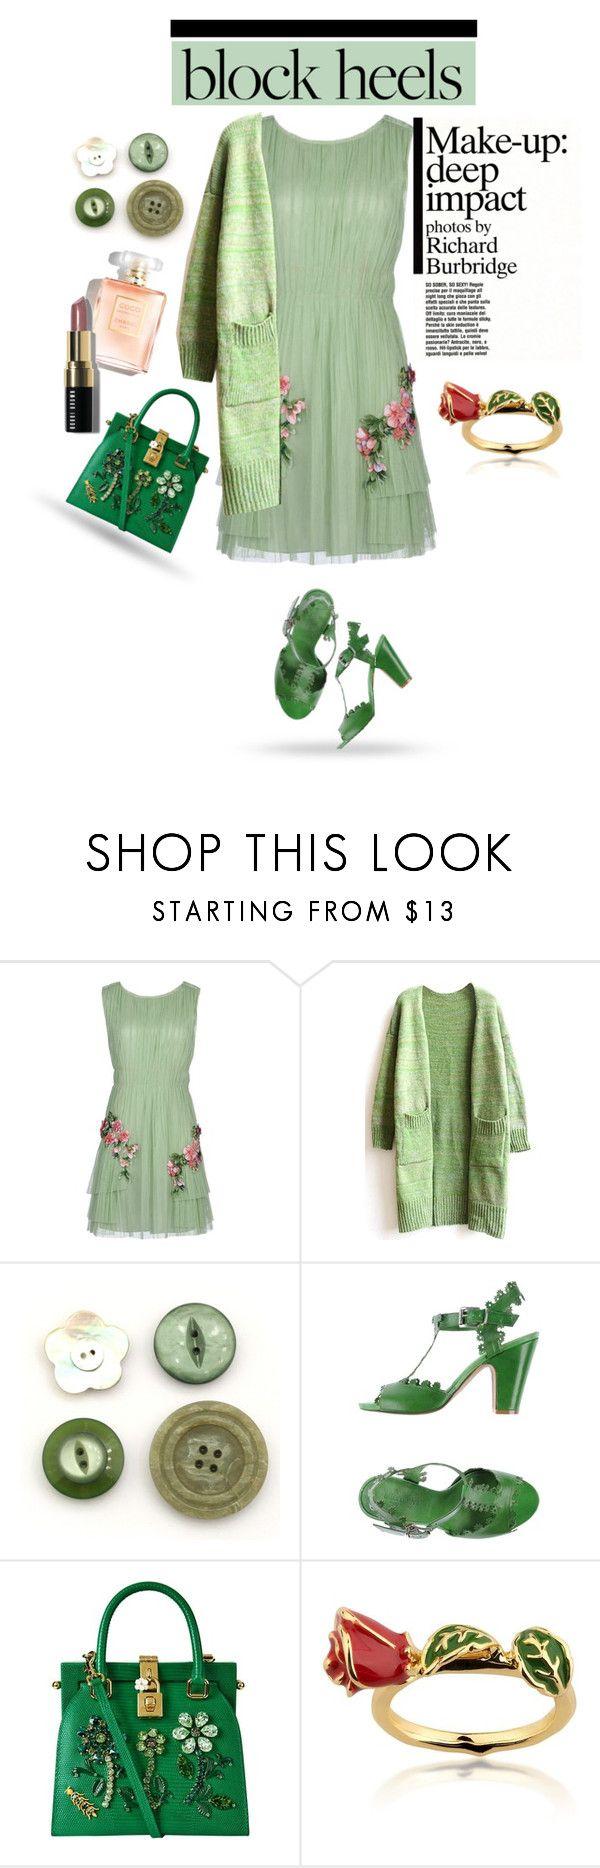 """Block Heels , contest"" by anne-977 ❤ liked on Polyvore featuring Alberta Ferretti, WithChic, Alternativa, Dolce&Gabbana, Disney, Bobbi Brown Cosmetics, blockheels and polyvorecontest"